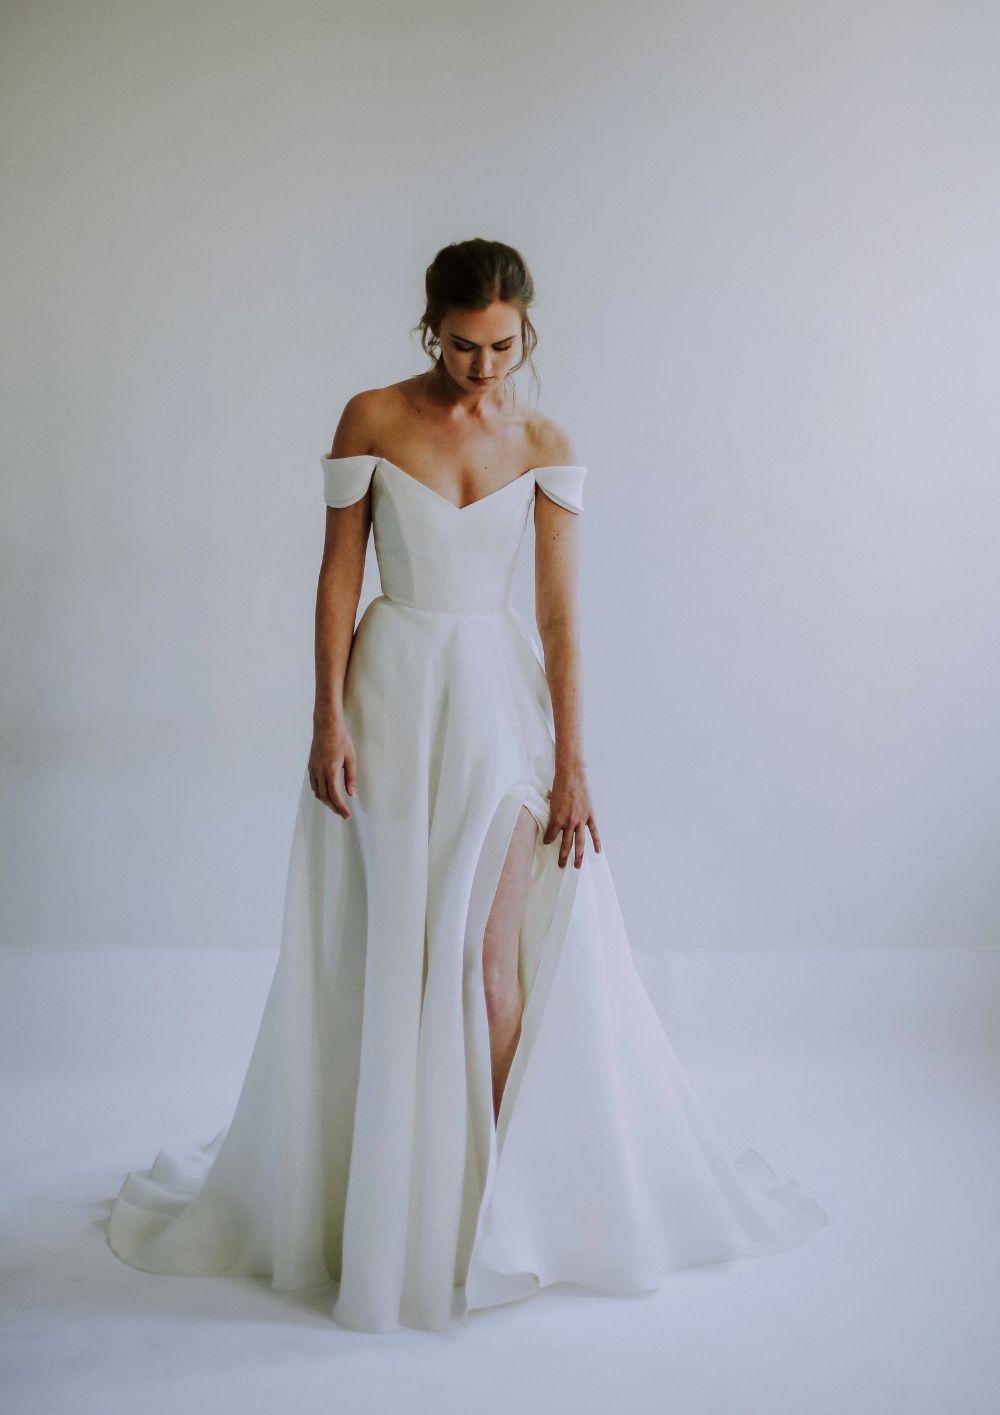 Lee Petra Grebenau Luxury List Of Pinterest 2019 Wedding Dresses Pictures Pinterest A Line Wedding Dress Wedding Dresses Summer Wedding Dress